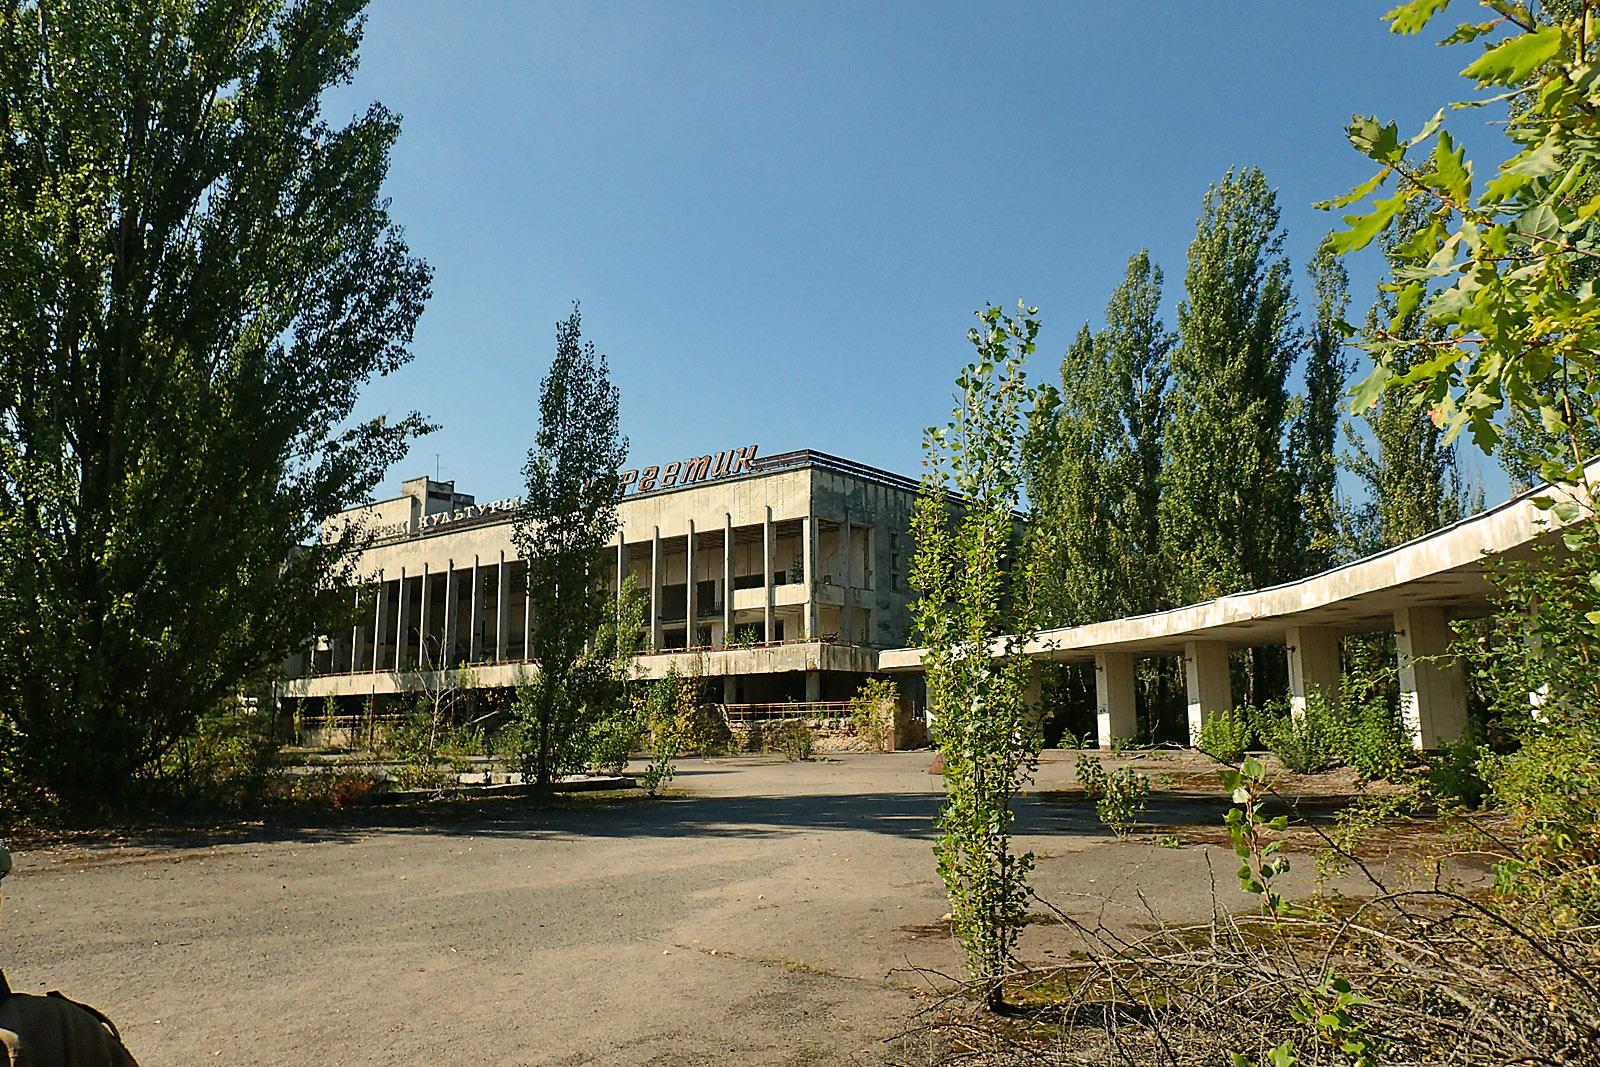 Prypjat Kulturzentrum